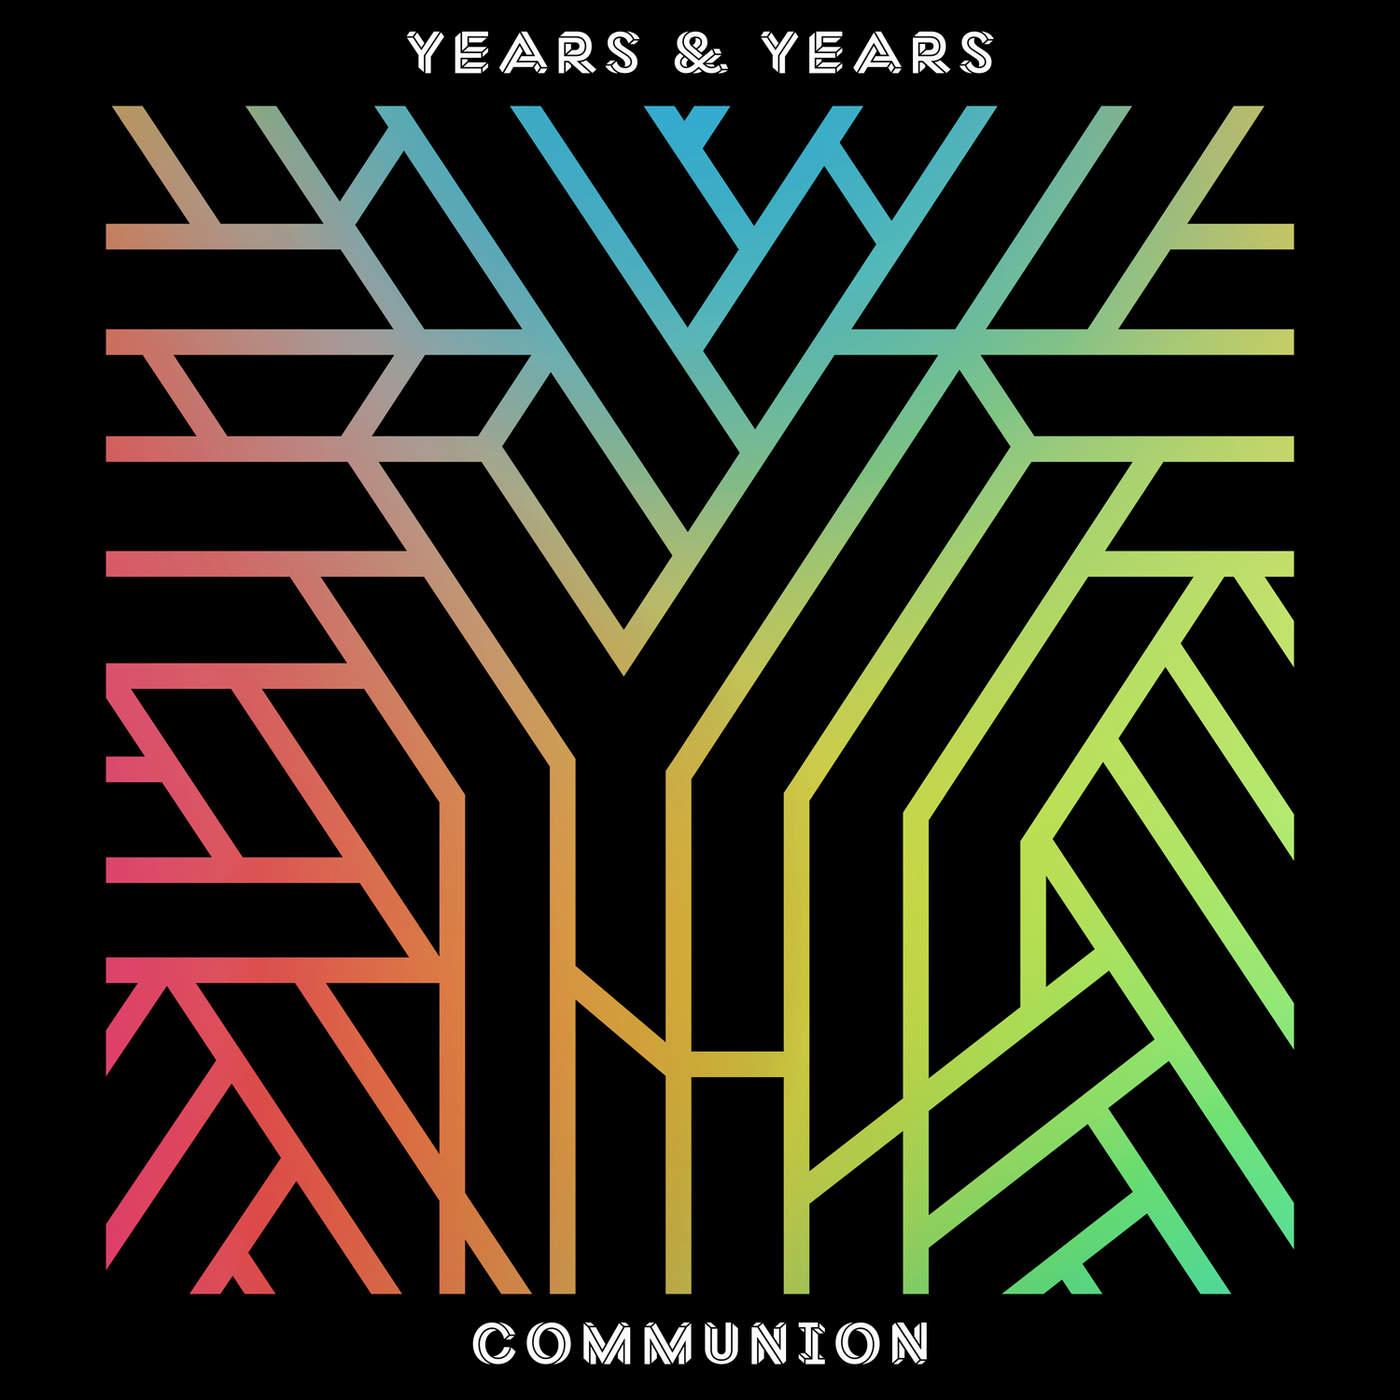 Years years communion 2015 1400x1400 final